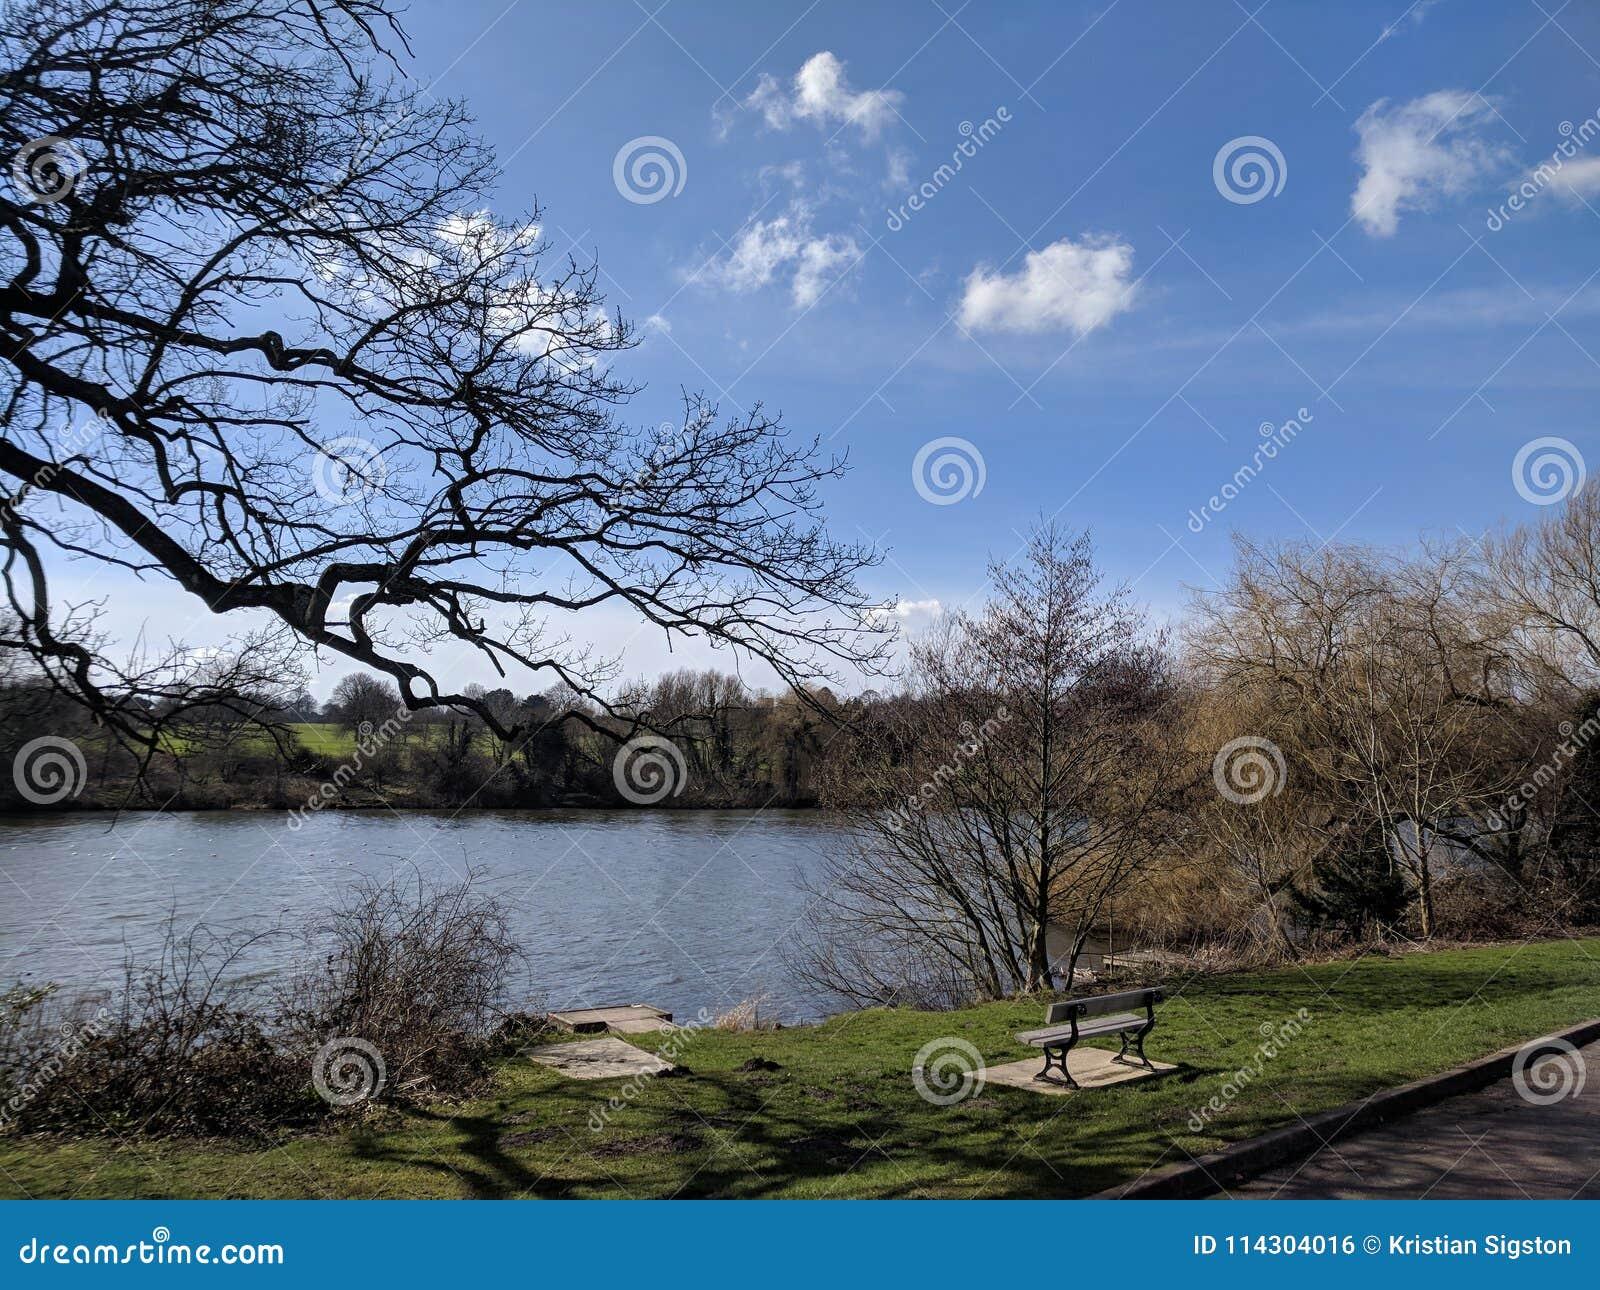 Landscape View At Moat Park, Maidstone, Kent, Medway, UK ...